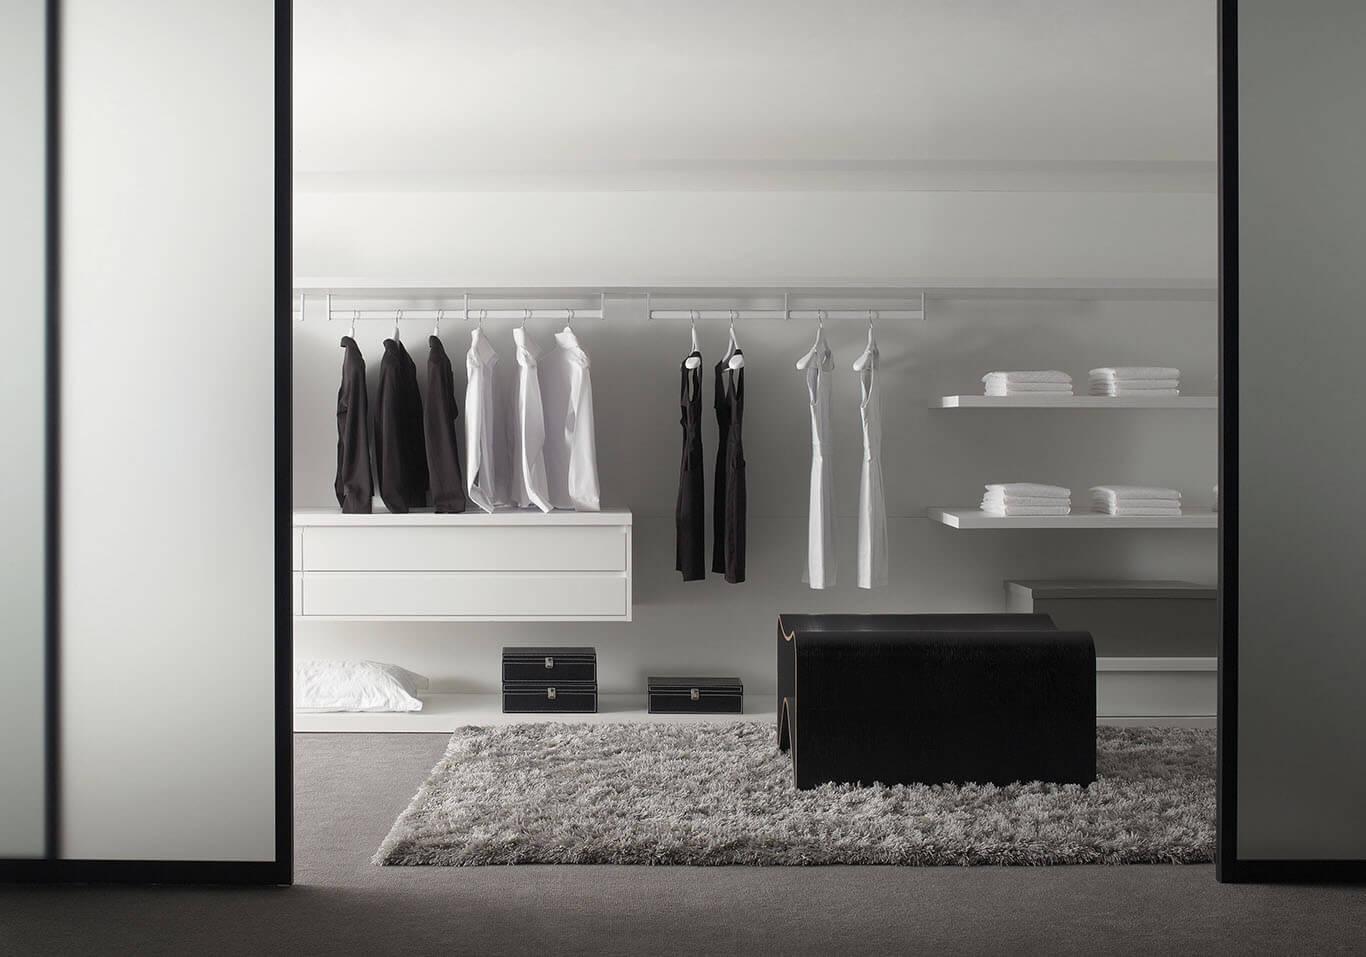 Dell Anno - Dormitório Ideias e Projetos8